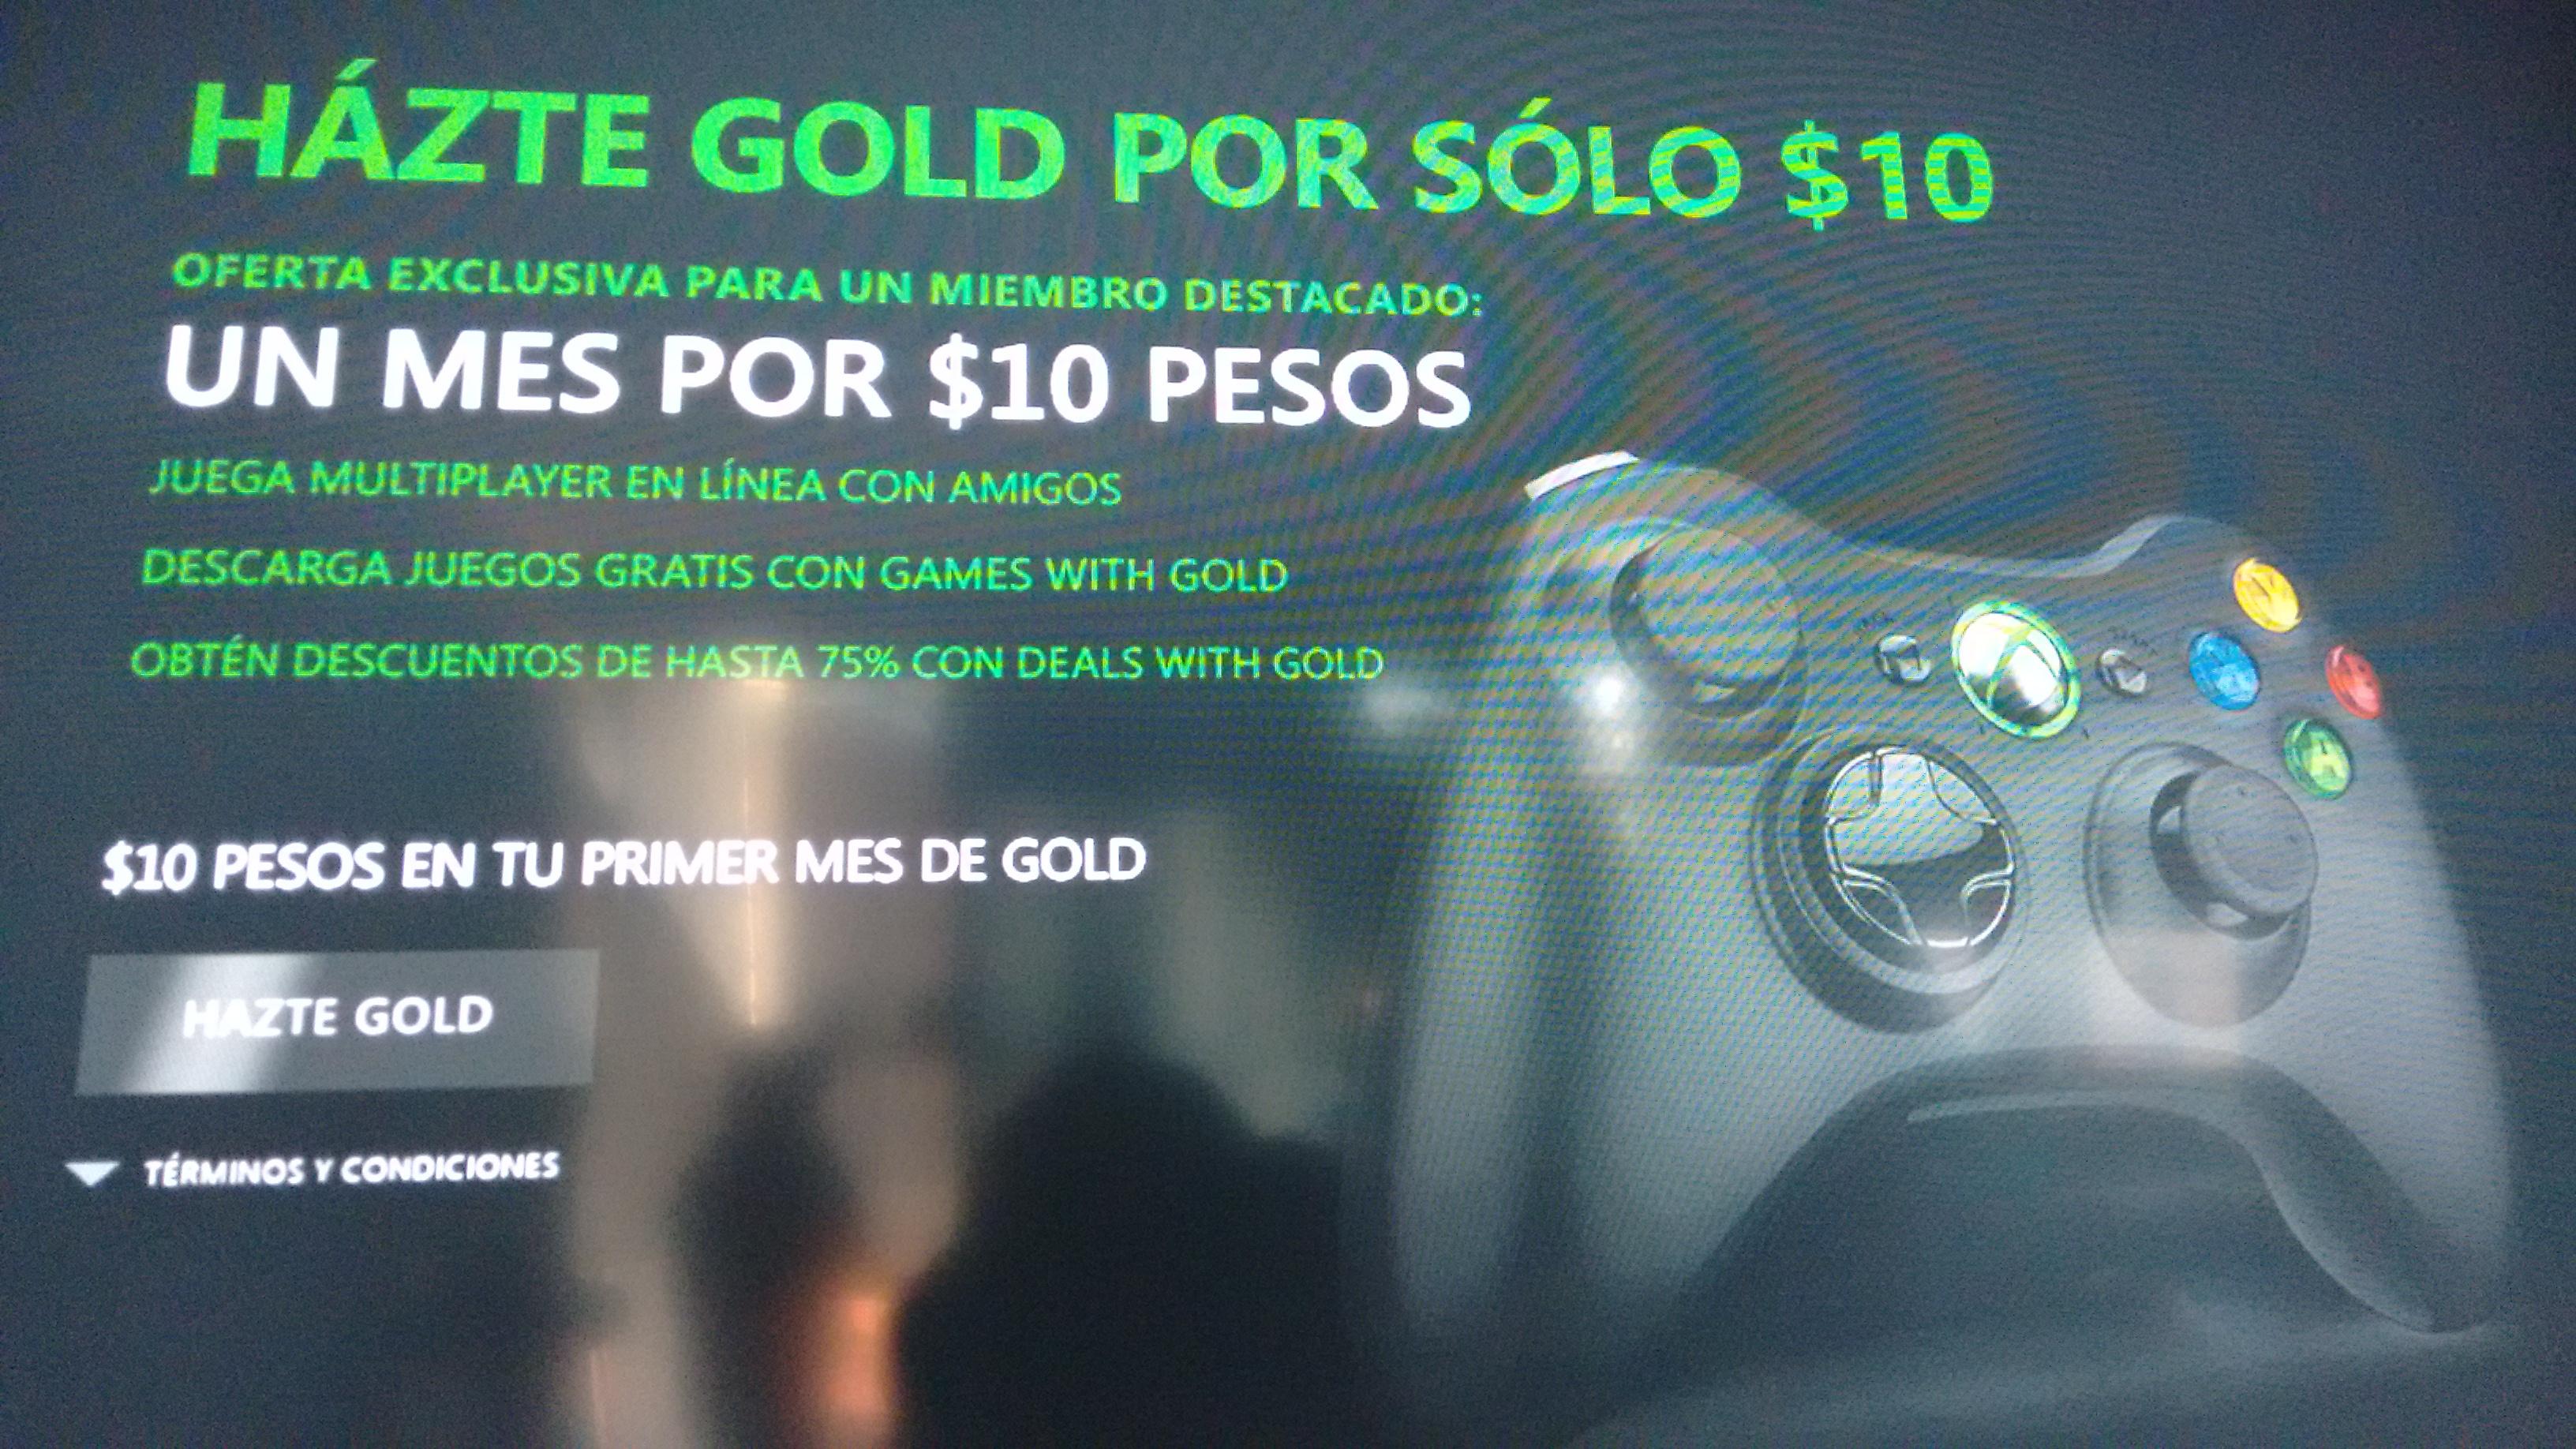 1 mes de xbox live gold por $10